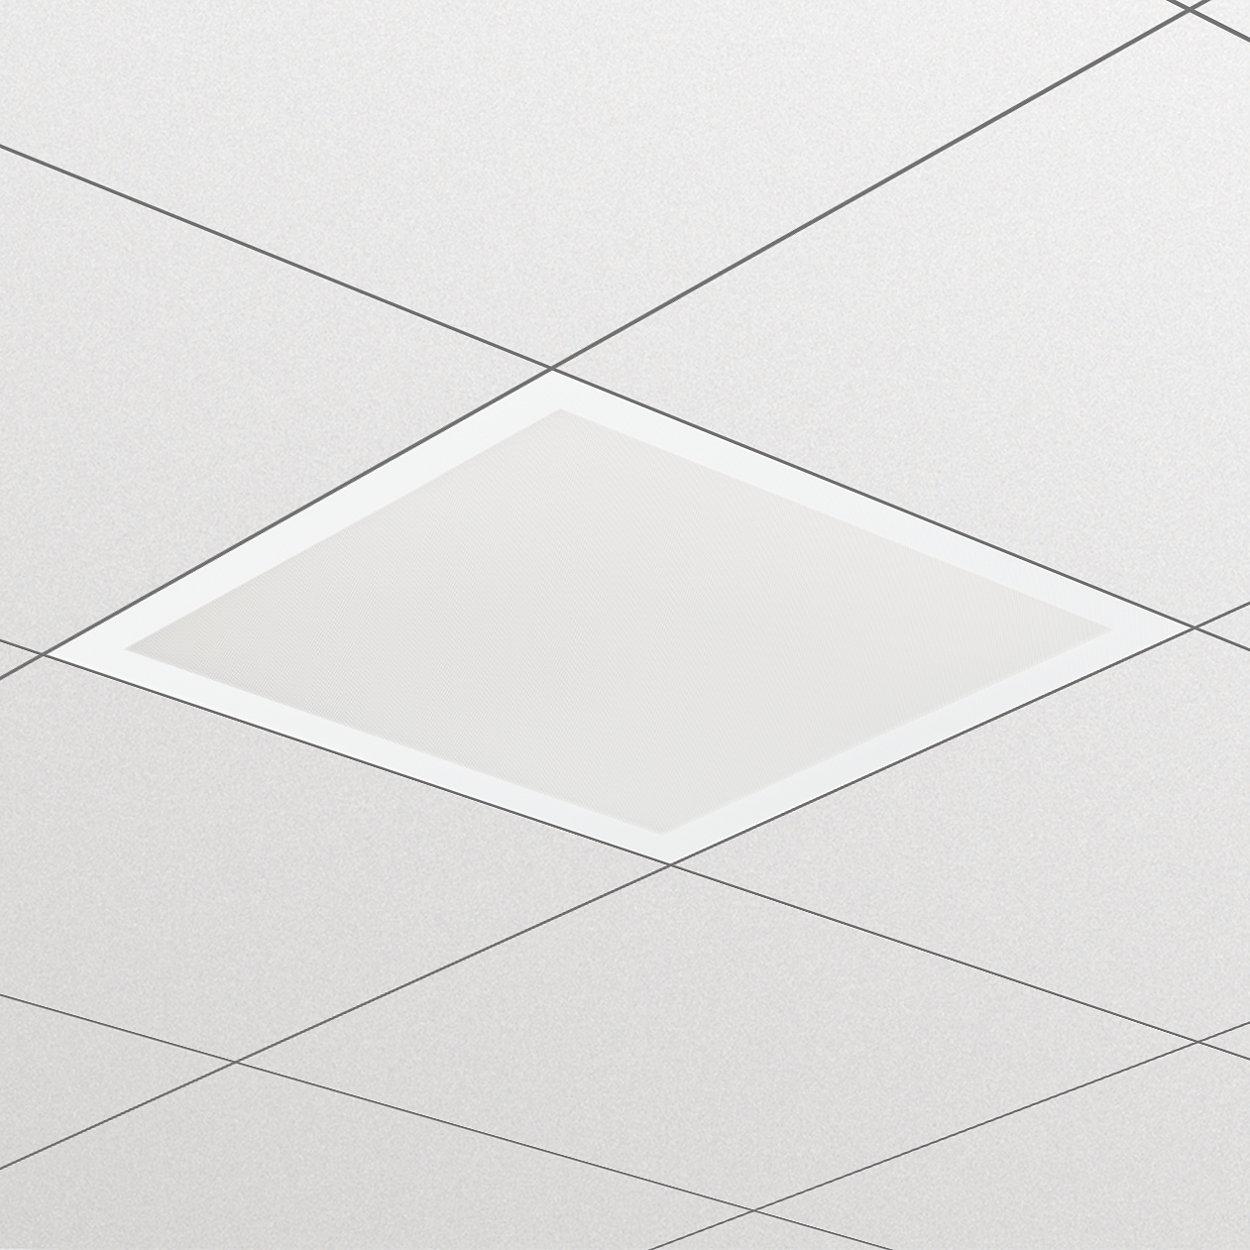 SlimBlend Square – High performance, advanced control